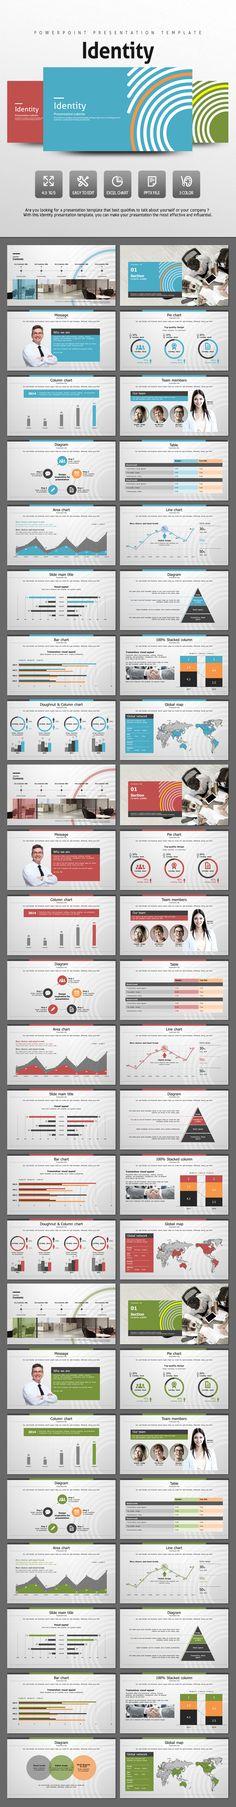 Identity PowerPoint Template #design #slides Download: http://graphicriver.net/item/identity/13093070?ref=ksioks